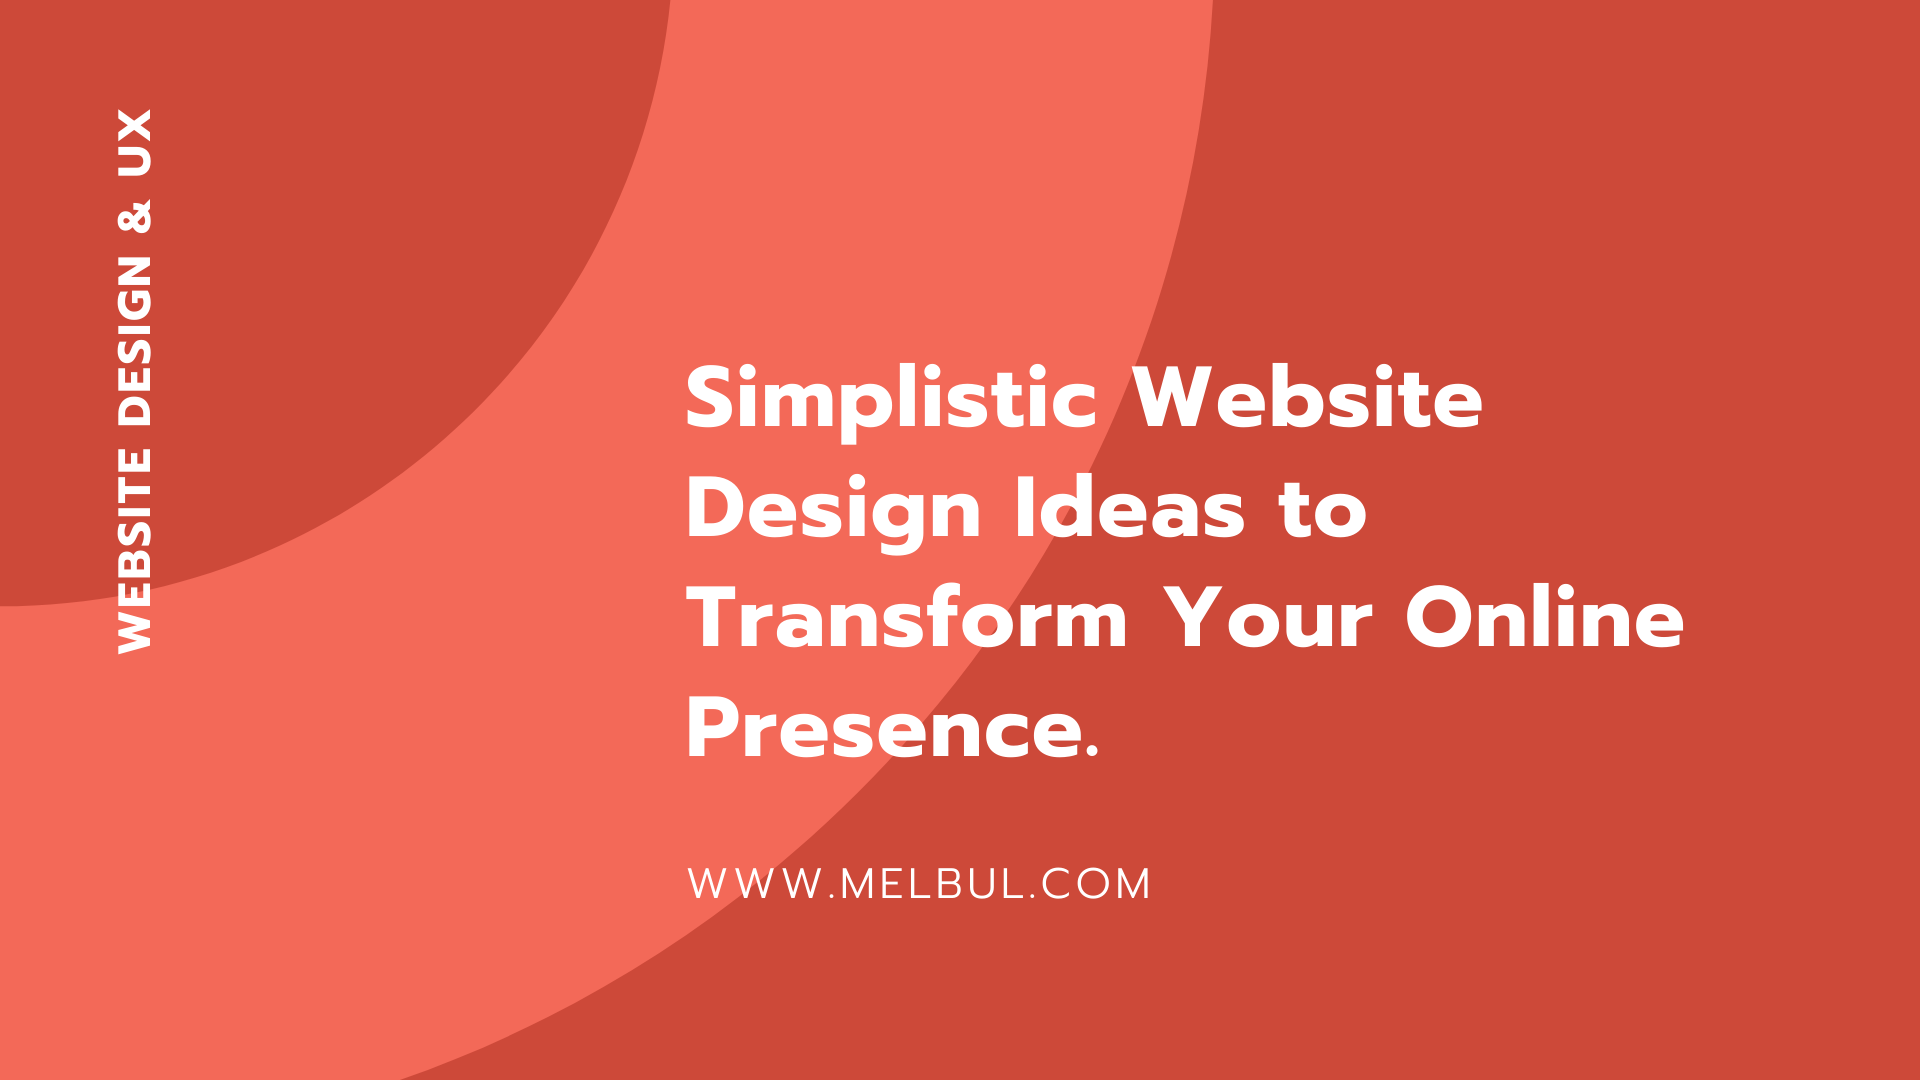 Simplistic Website Design Ideas to Transform Your Online Presence.